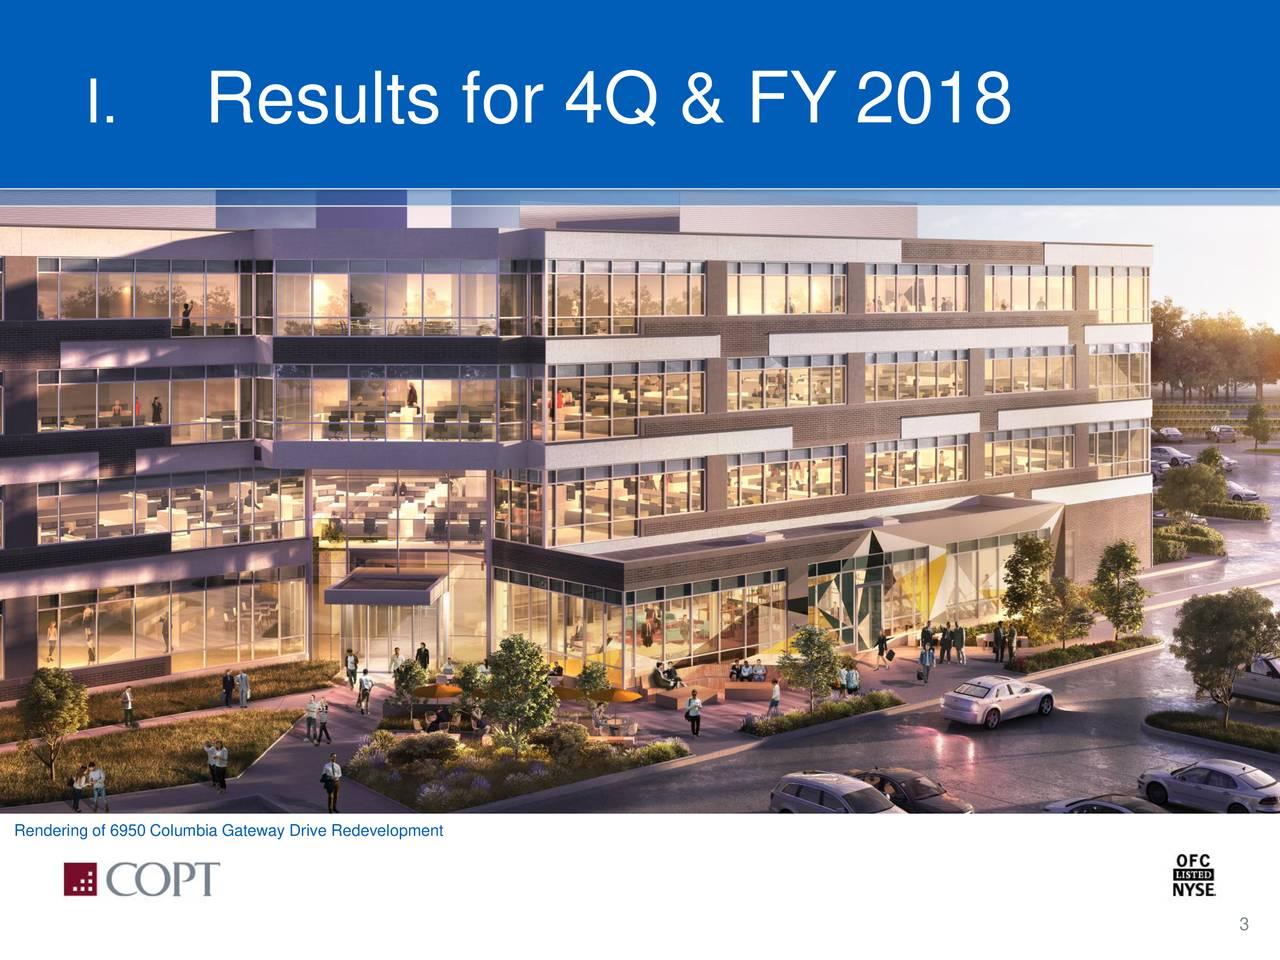 Rendering of 6950 Columbia Gateway Drive Redevelopment 3